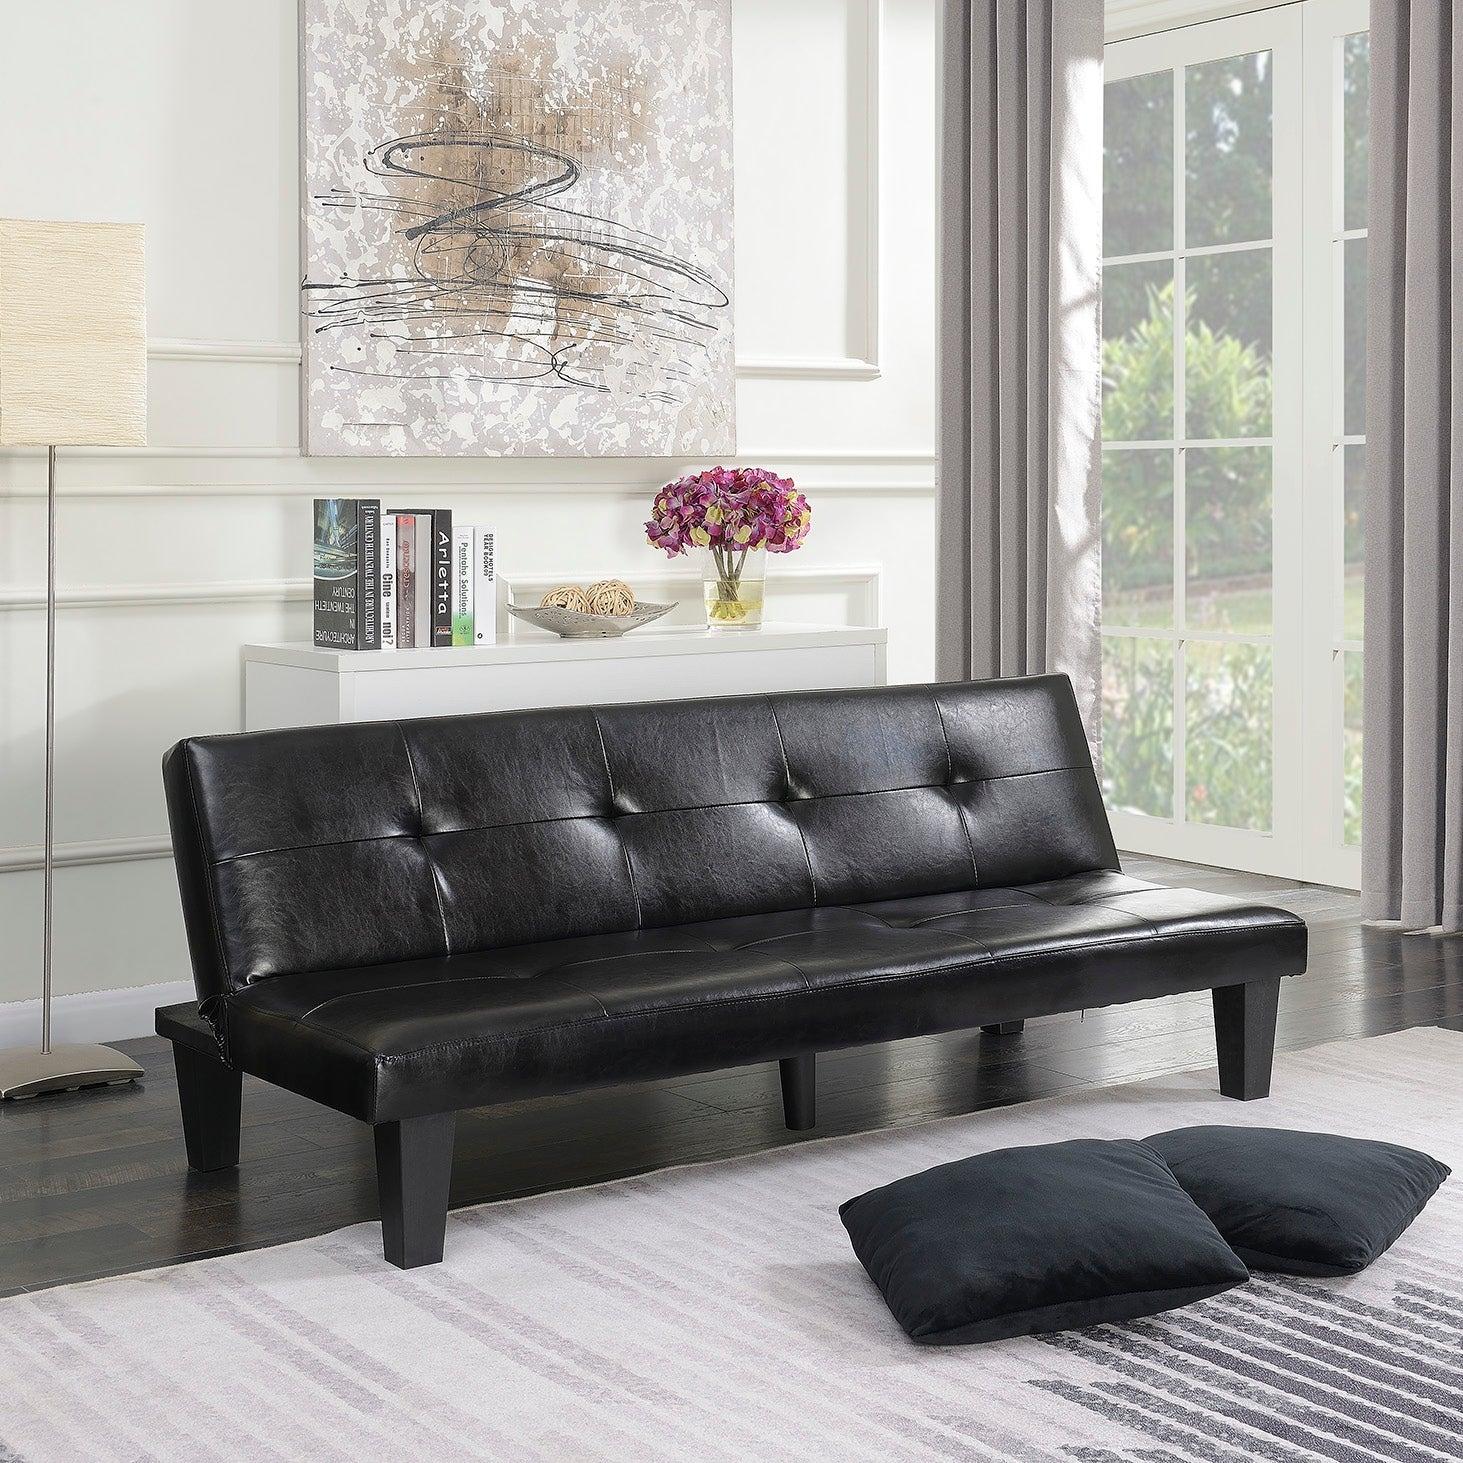 Fold Down Futon Convertible Sofa Bed